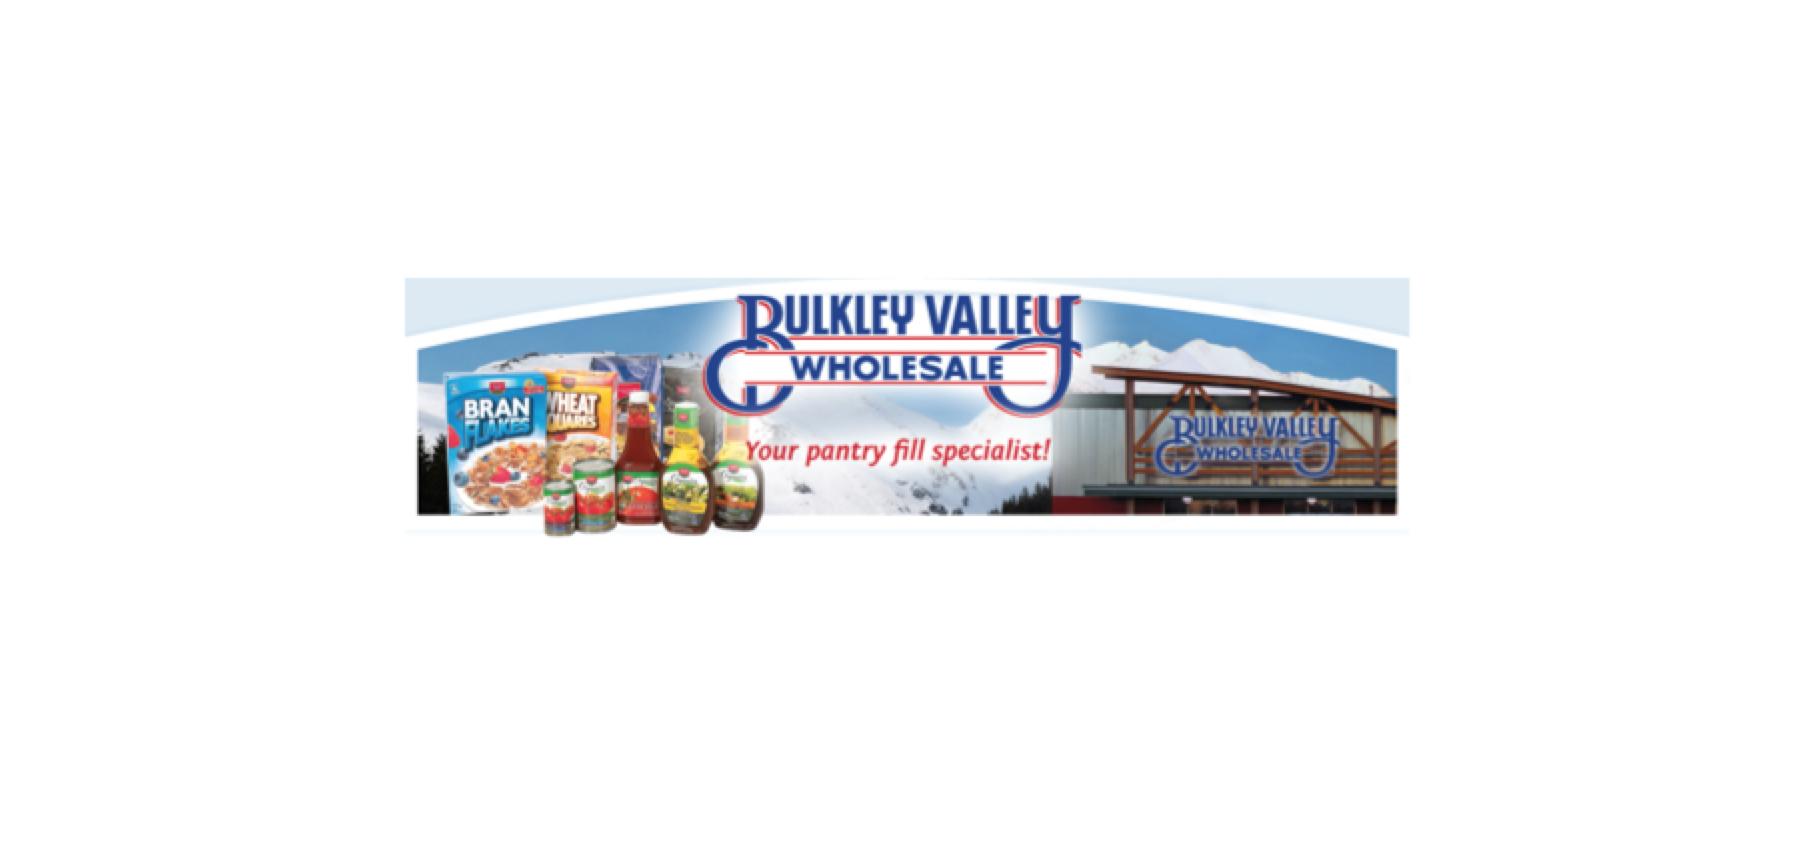 Bulkley Valley Wholesale